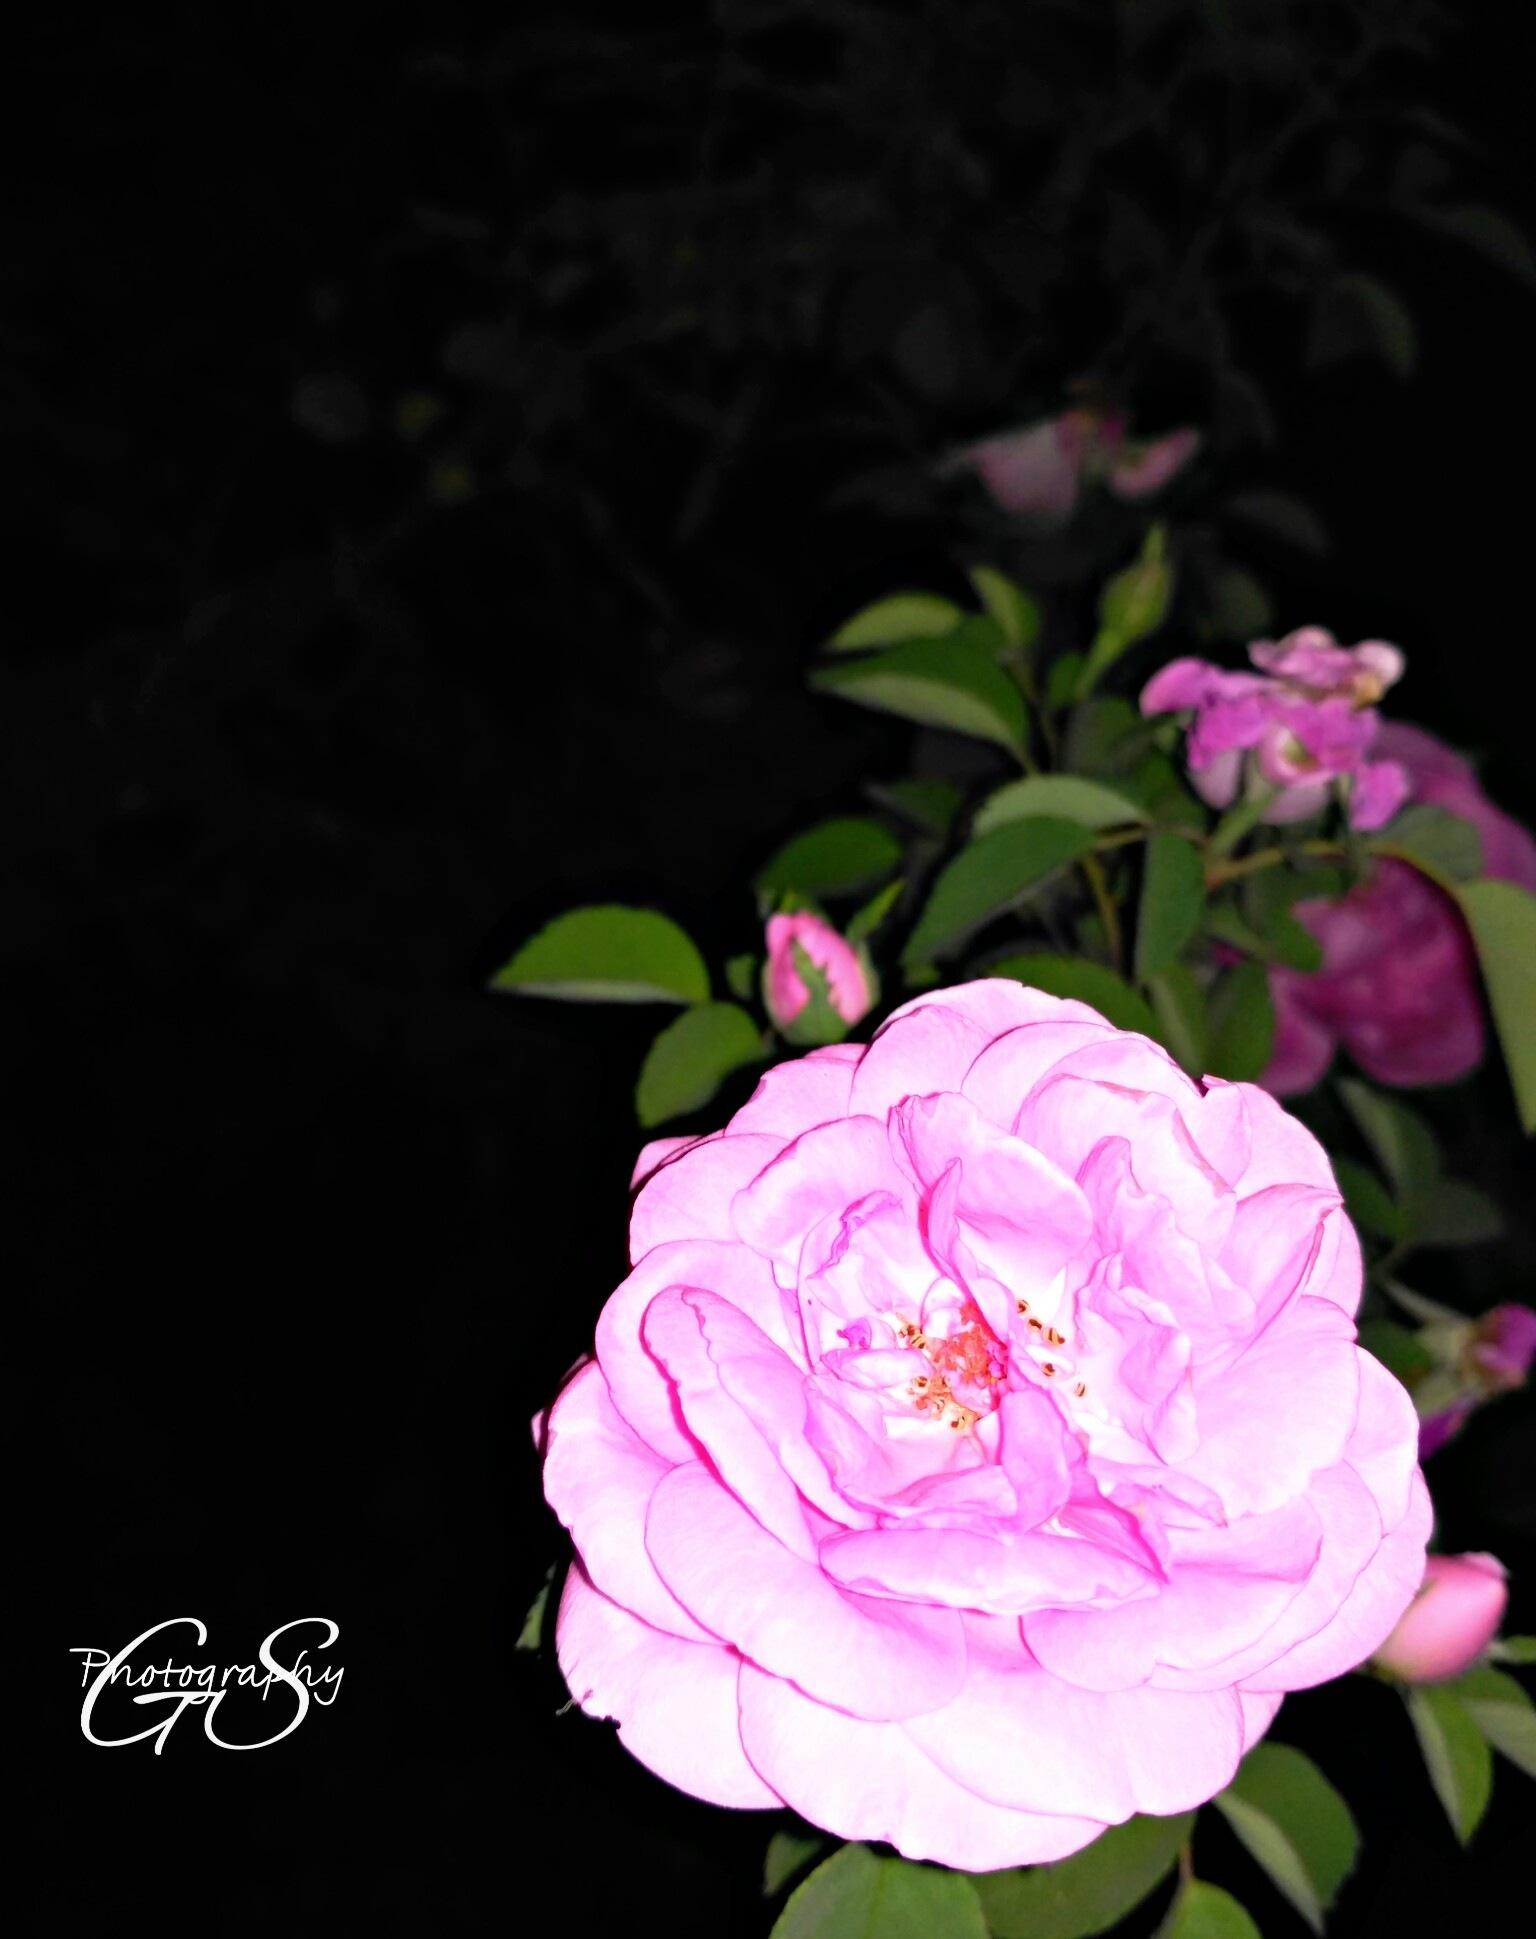 Rose  by Gursharndeep Singh